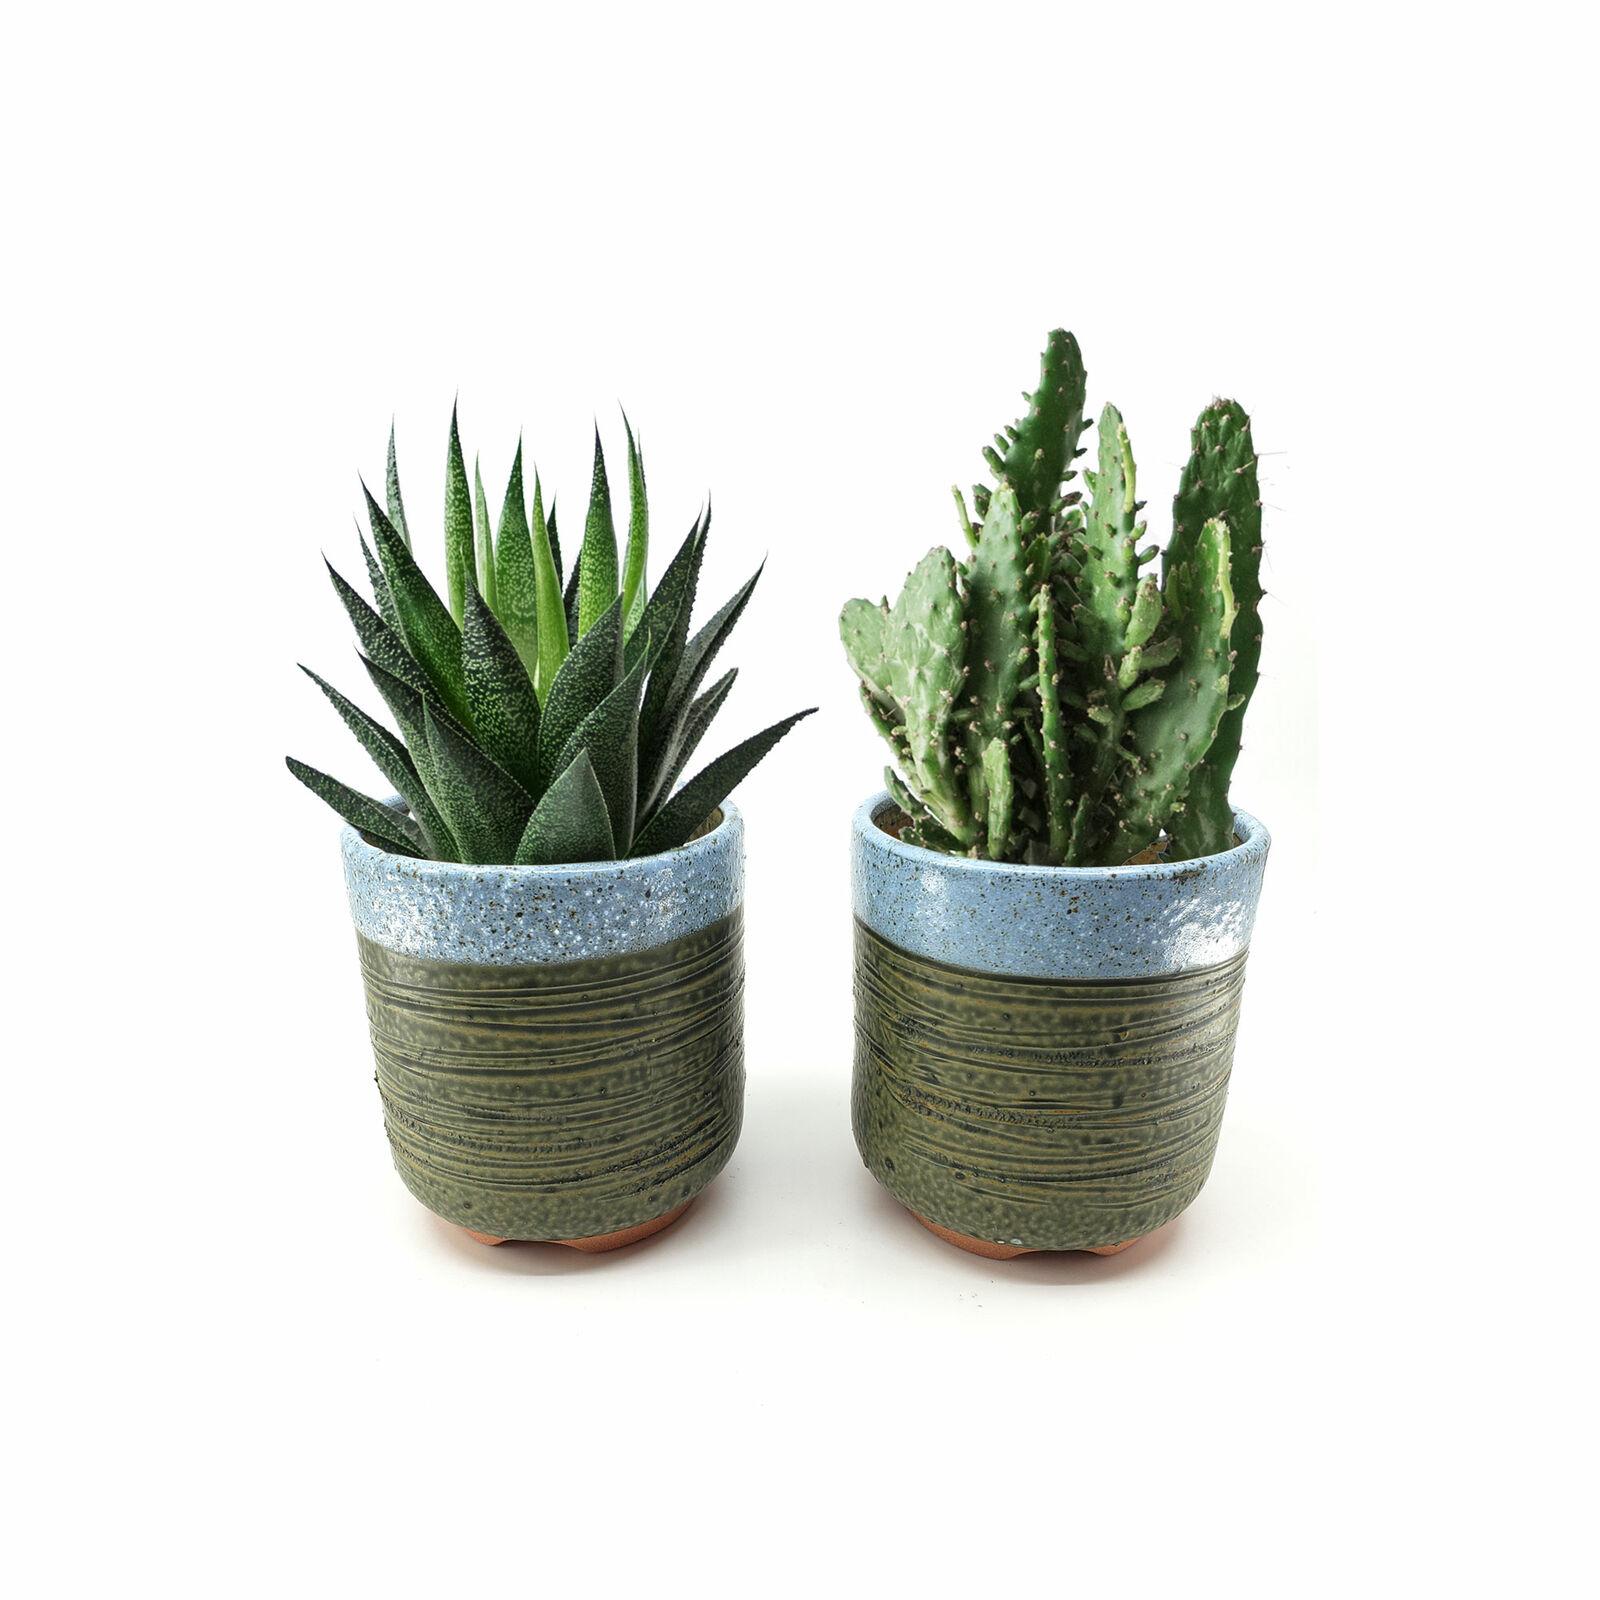 Set of 2, Tomnada 4 Inch Container Planter Ceramic Handmade Flower Pot For Plant